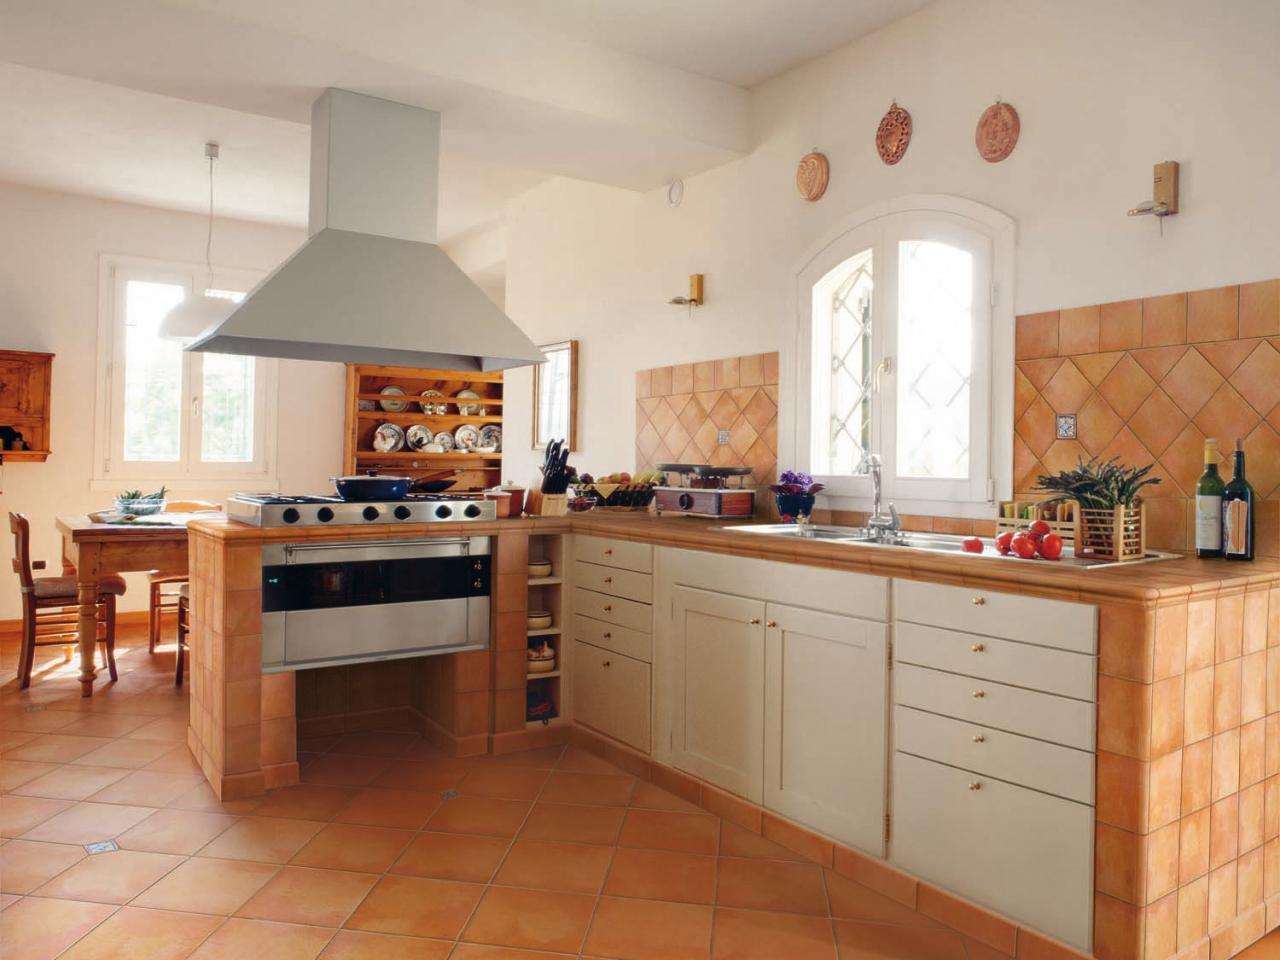 tile hgtv countertops kitchens kitchen design videos rooms countertop